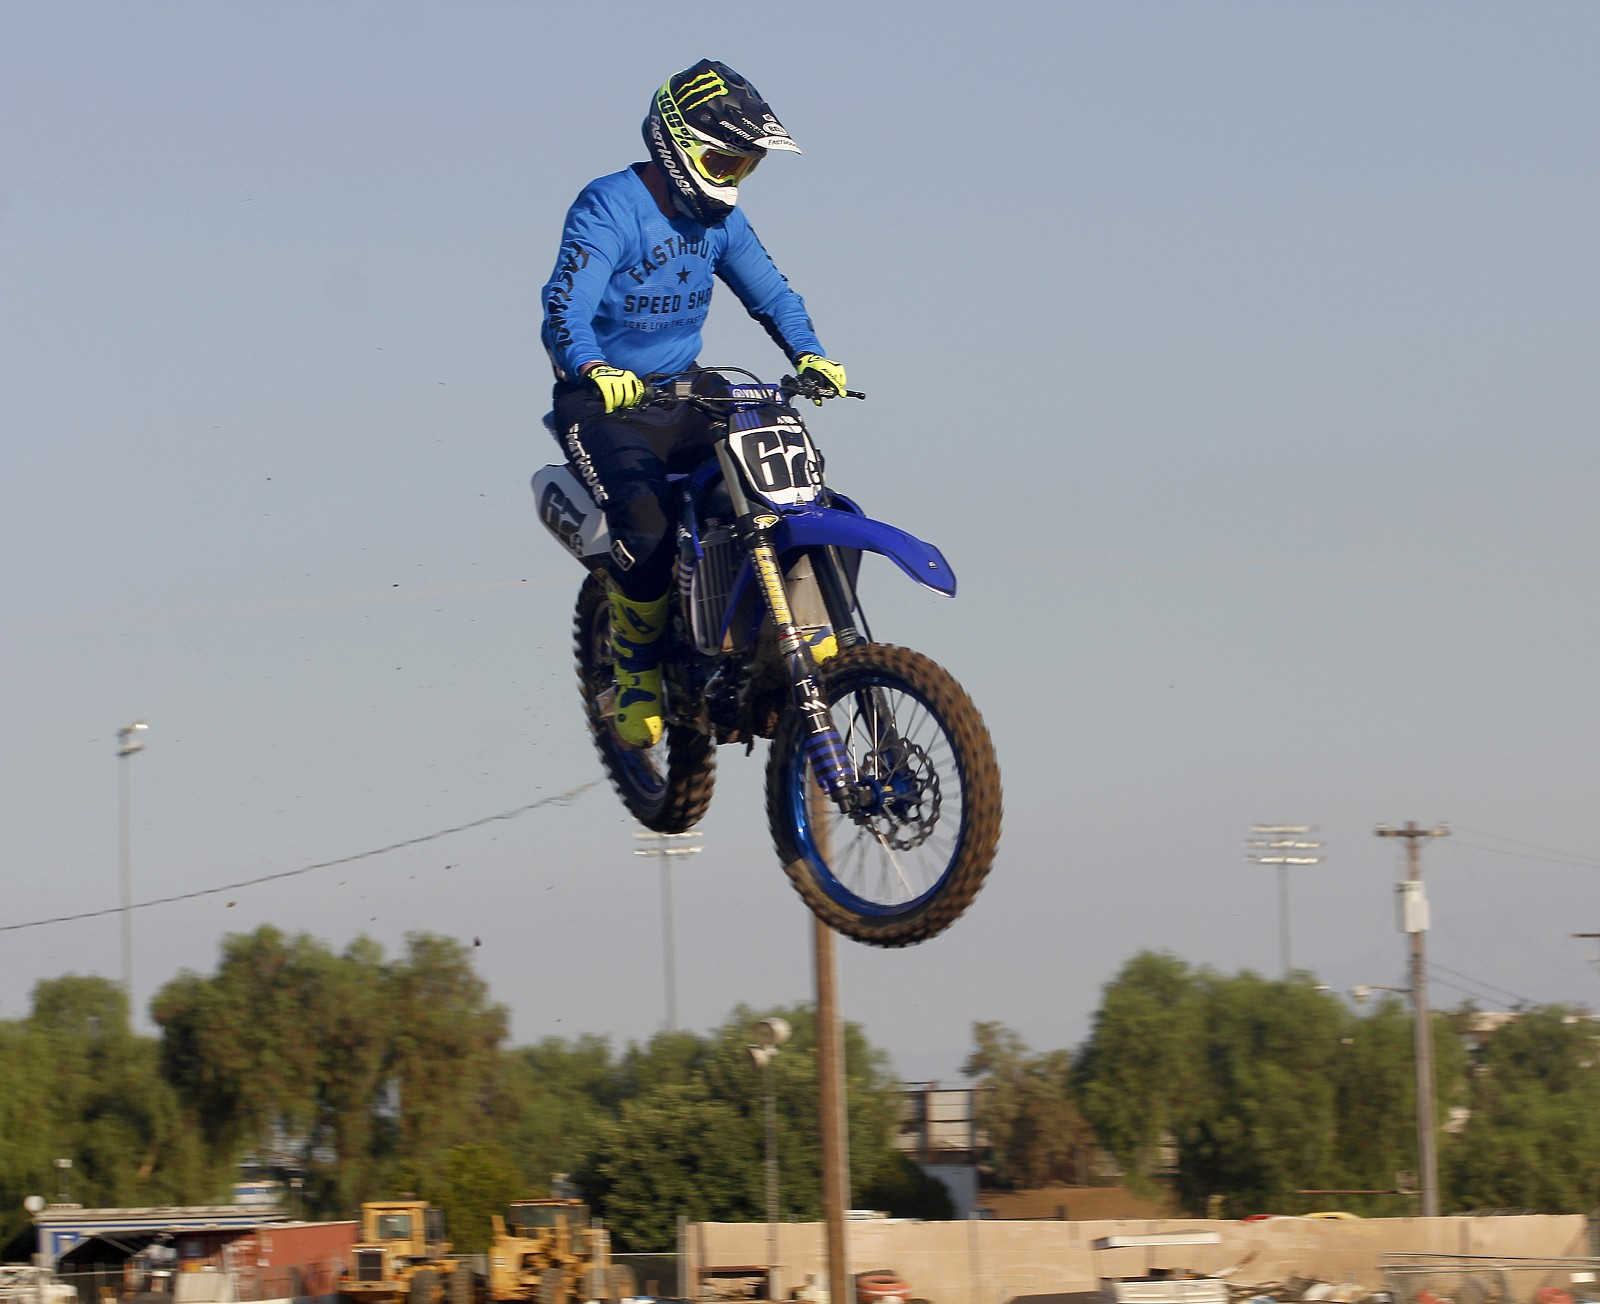 MG 5127 - moto67e - Motocross Pictures - Vital MX